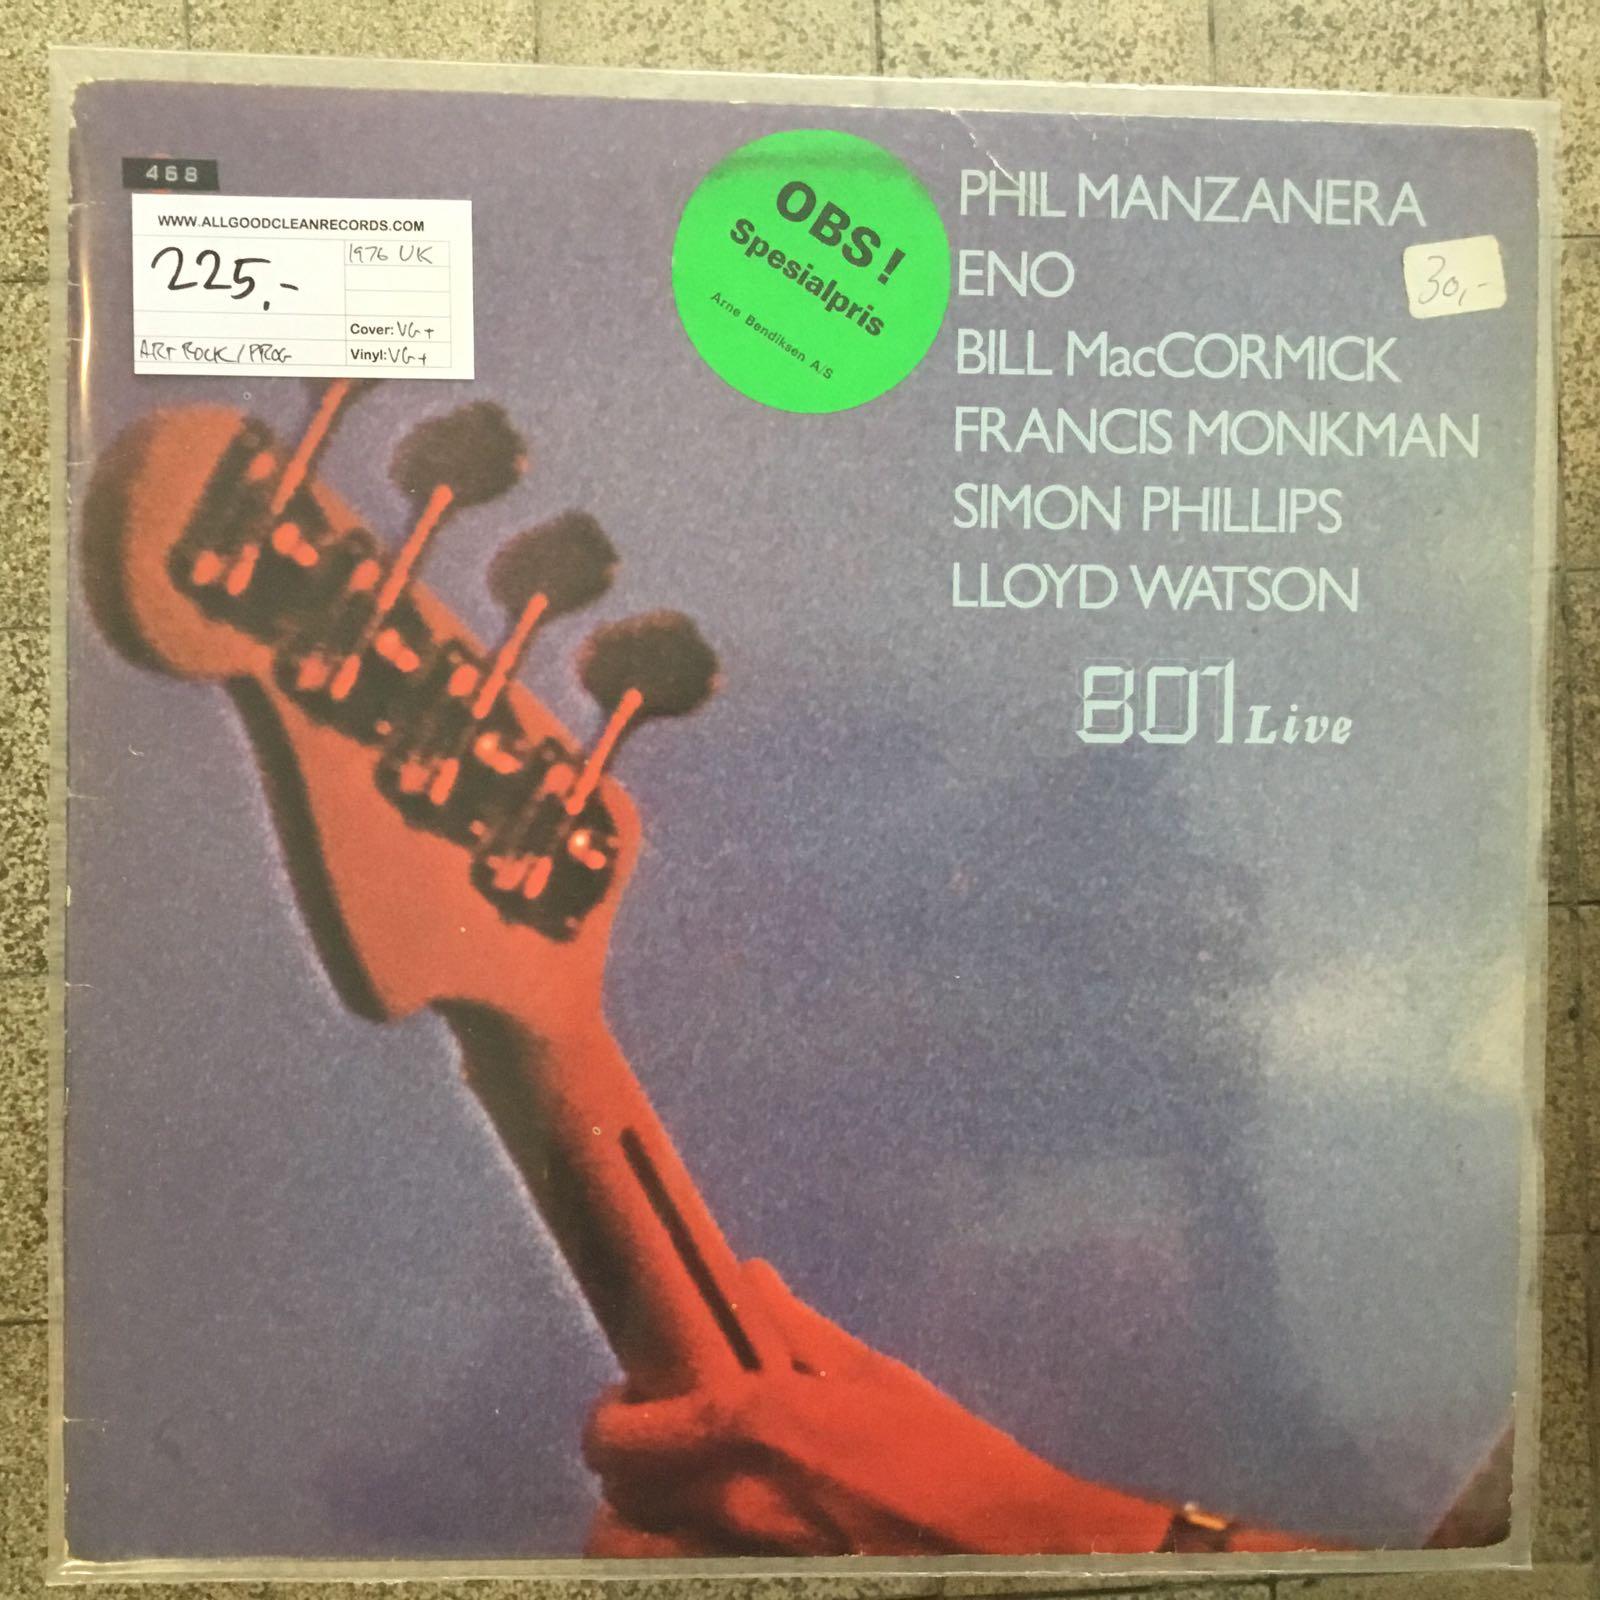 801 – 801 Live [LP] (2. hand)